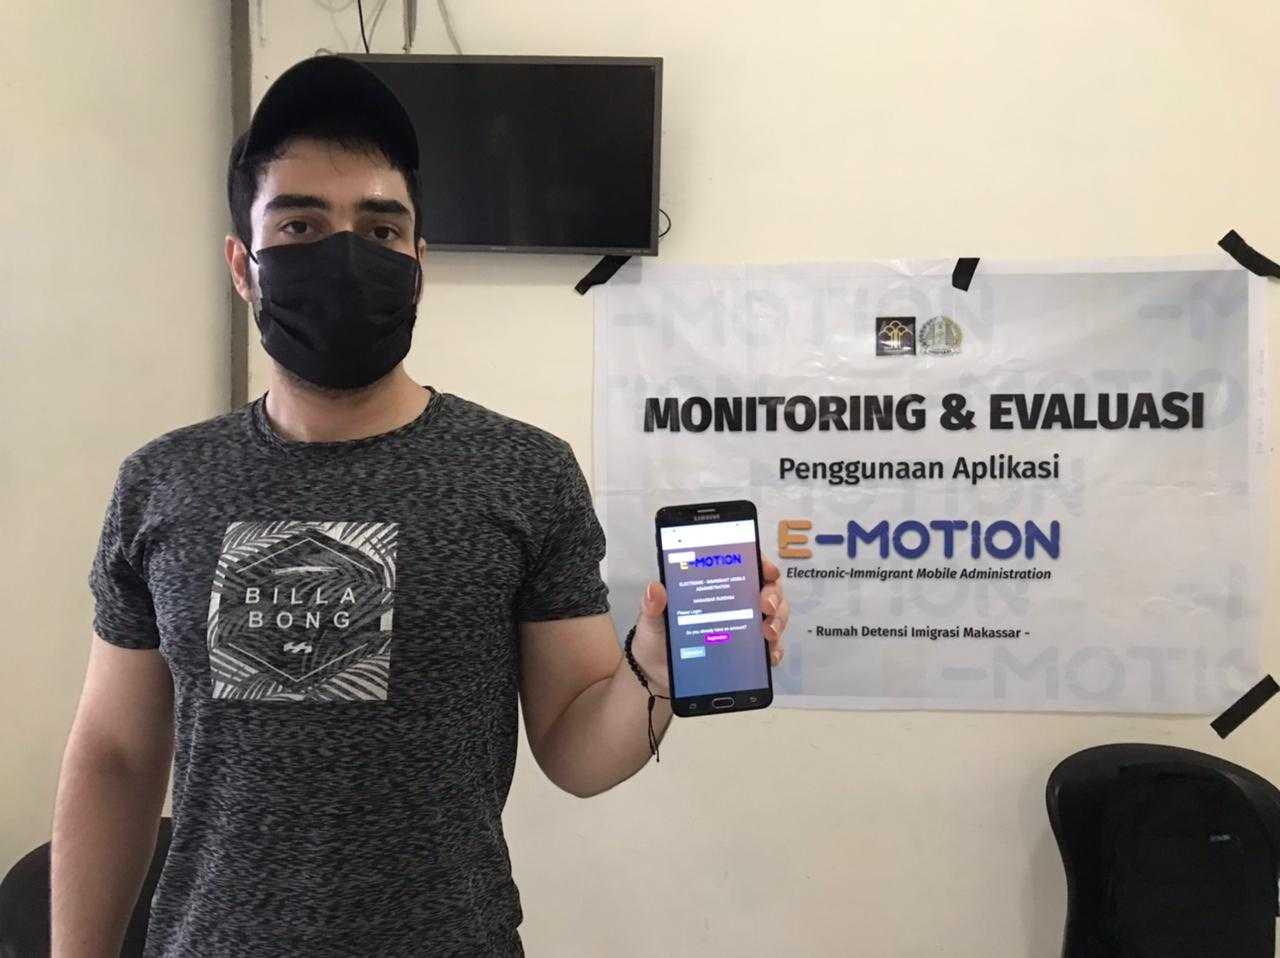 Aplikasi E-Motion, Cara Moderen Rudenim Makassar Monitoring Pengungsi Luar Negeri